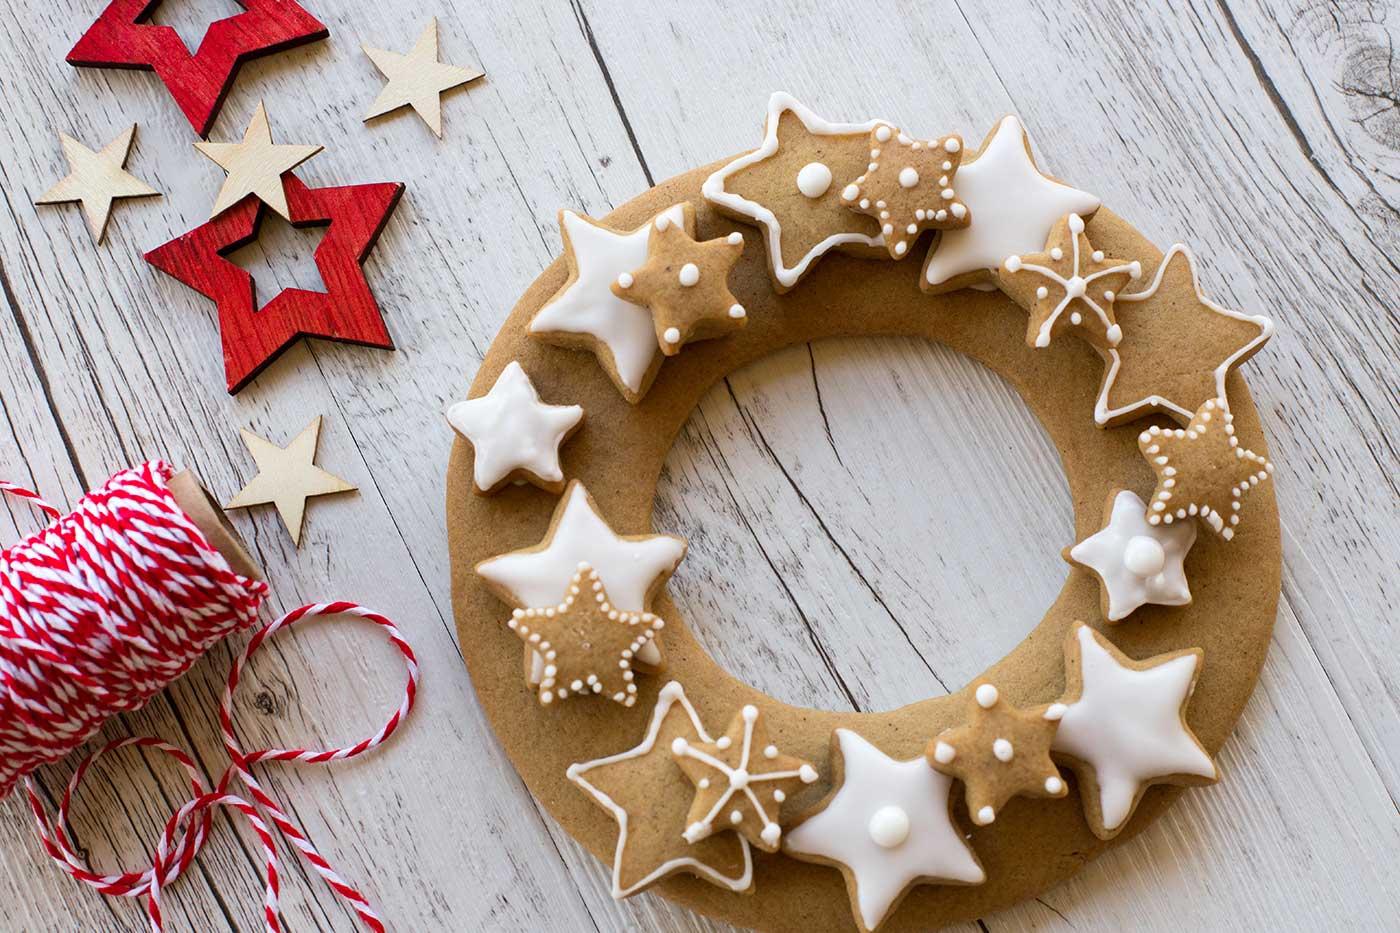 Gingerbread-Wreath-Thermomix-Recipe